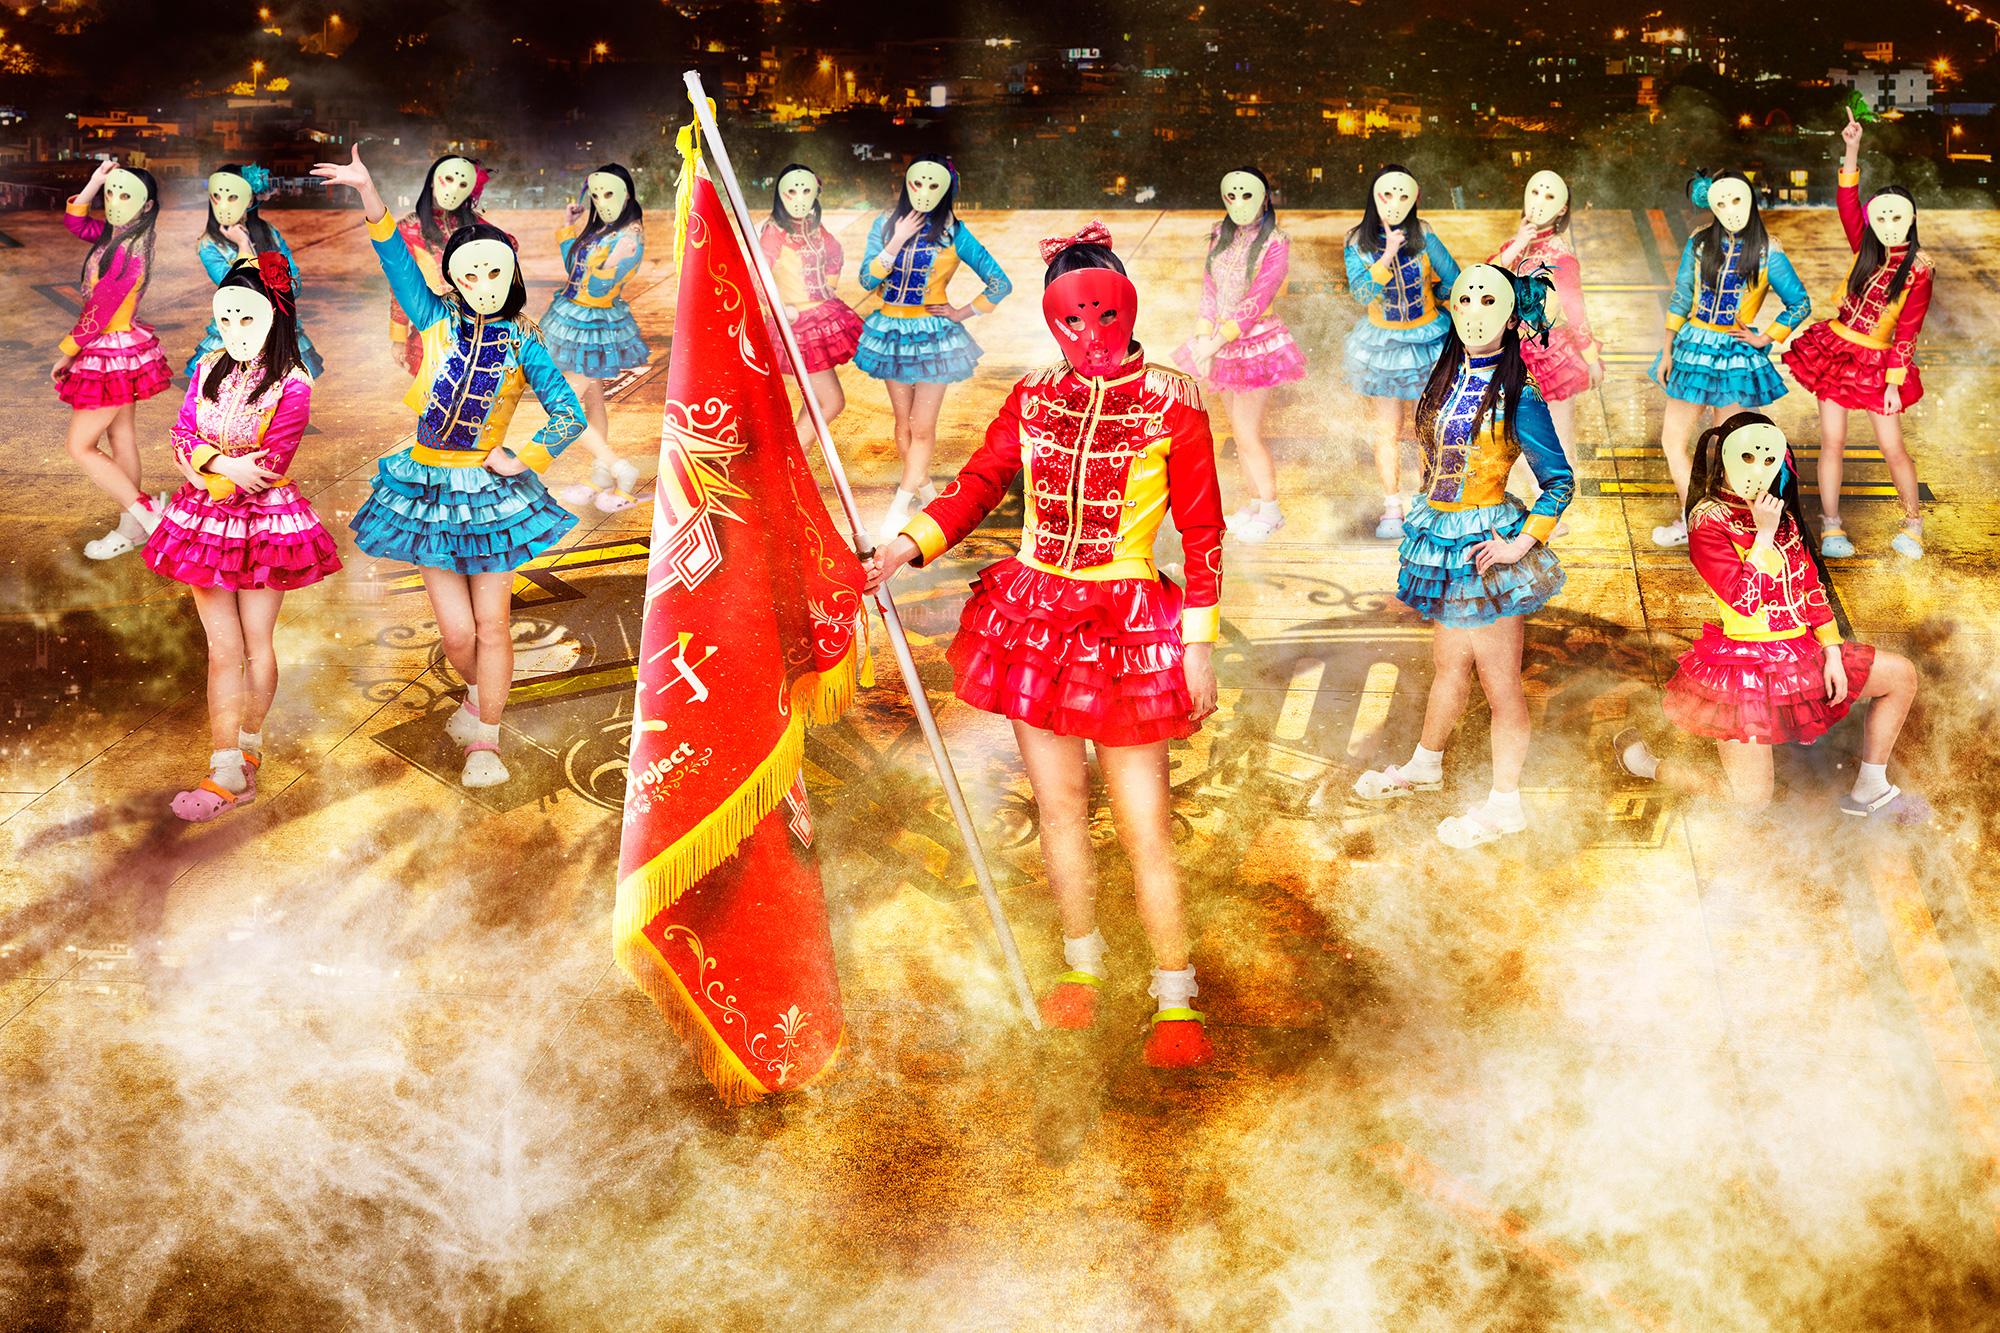 RMMS-Kamen-Joshi-3-million-Facebook-1